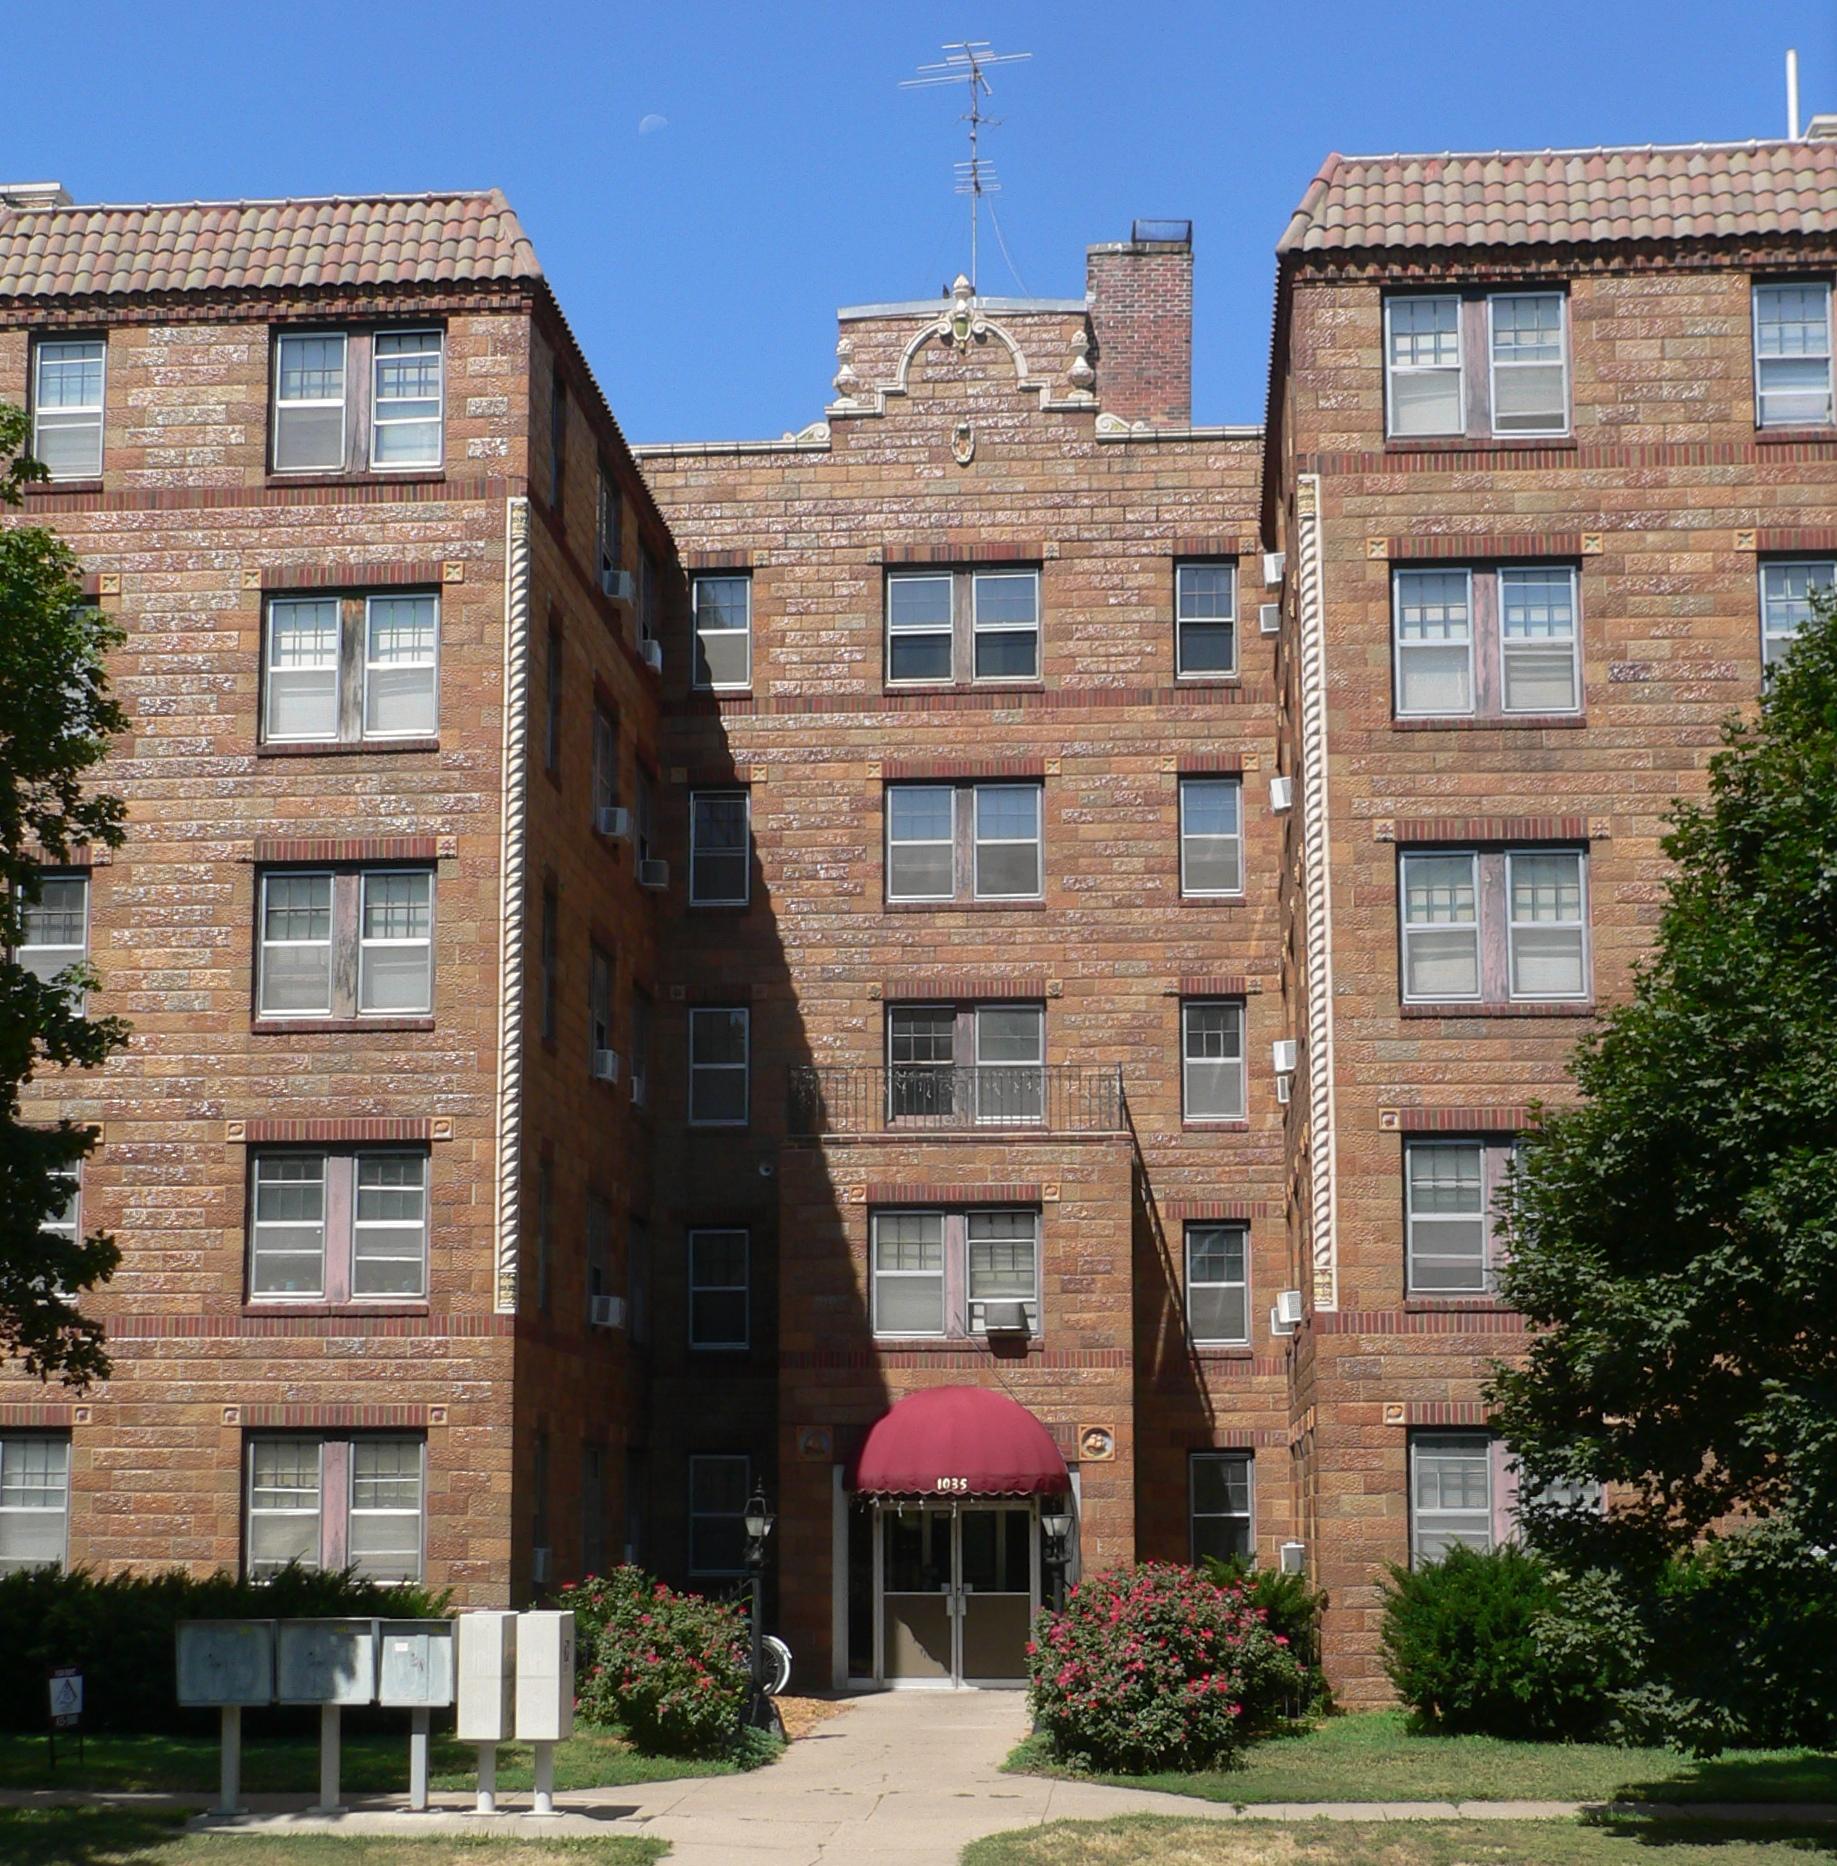 Lincoln Ne Apartments: File:Palisade-Regent Apts (Lincoln, NE) 1035 From E 1.JPG